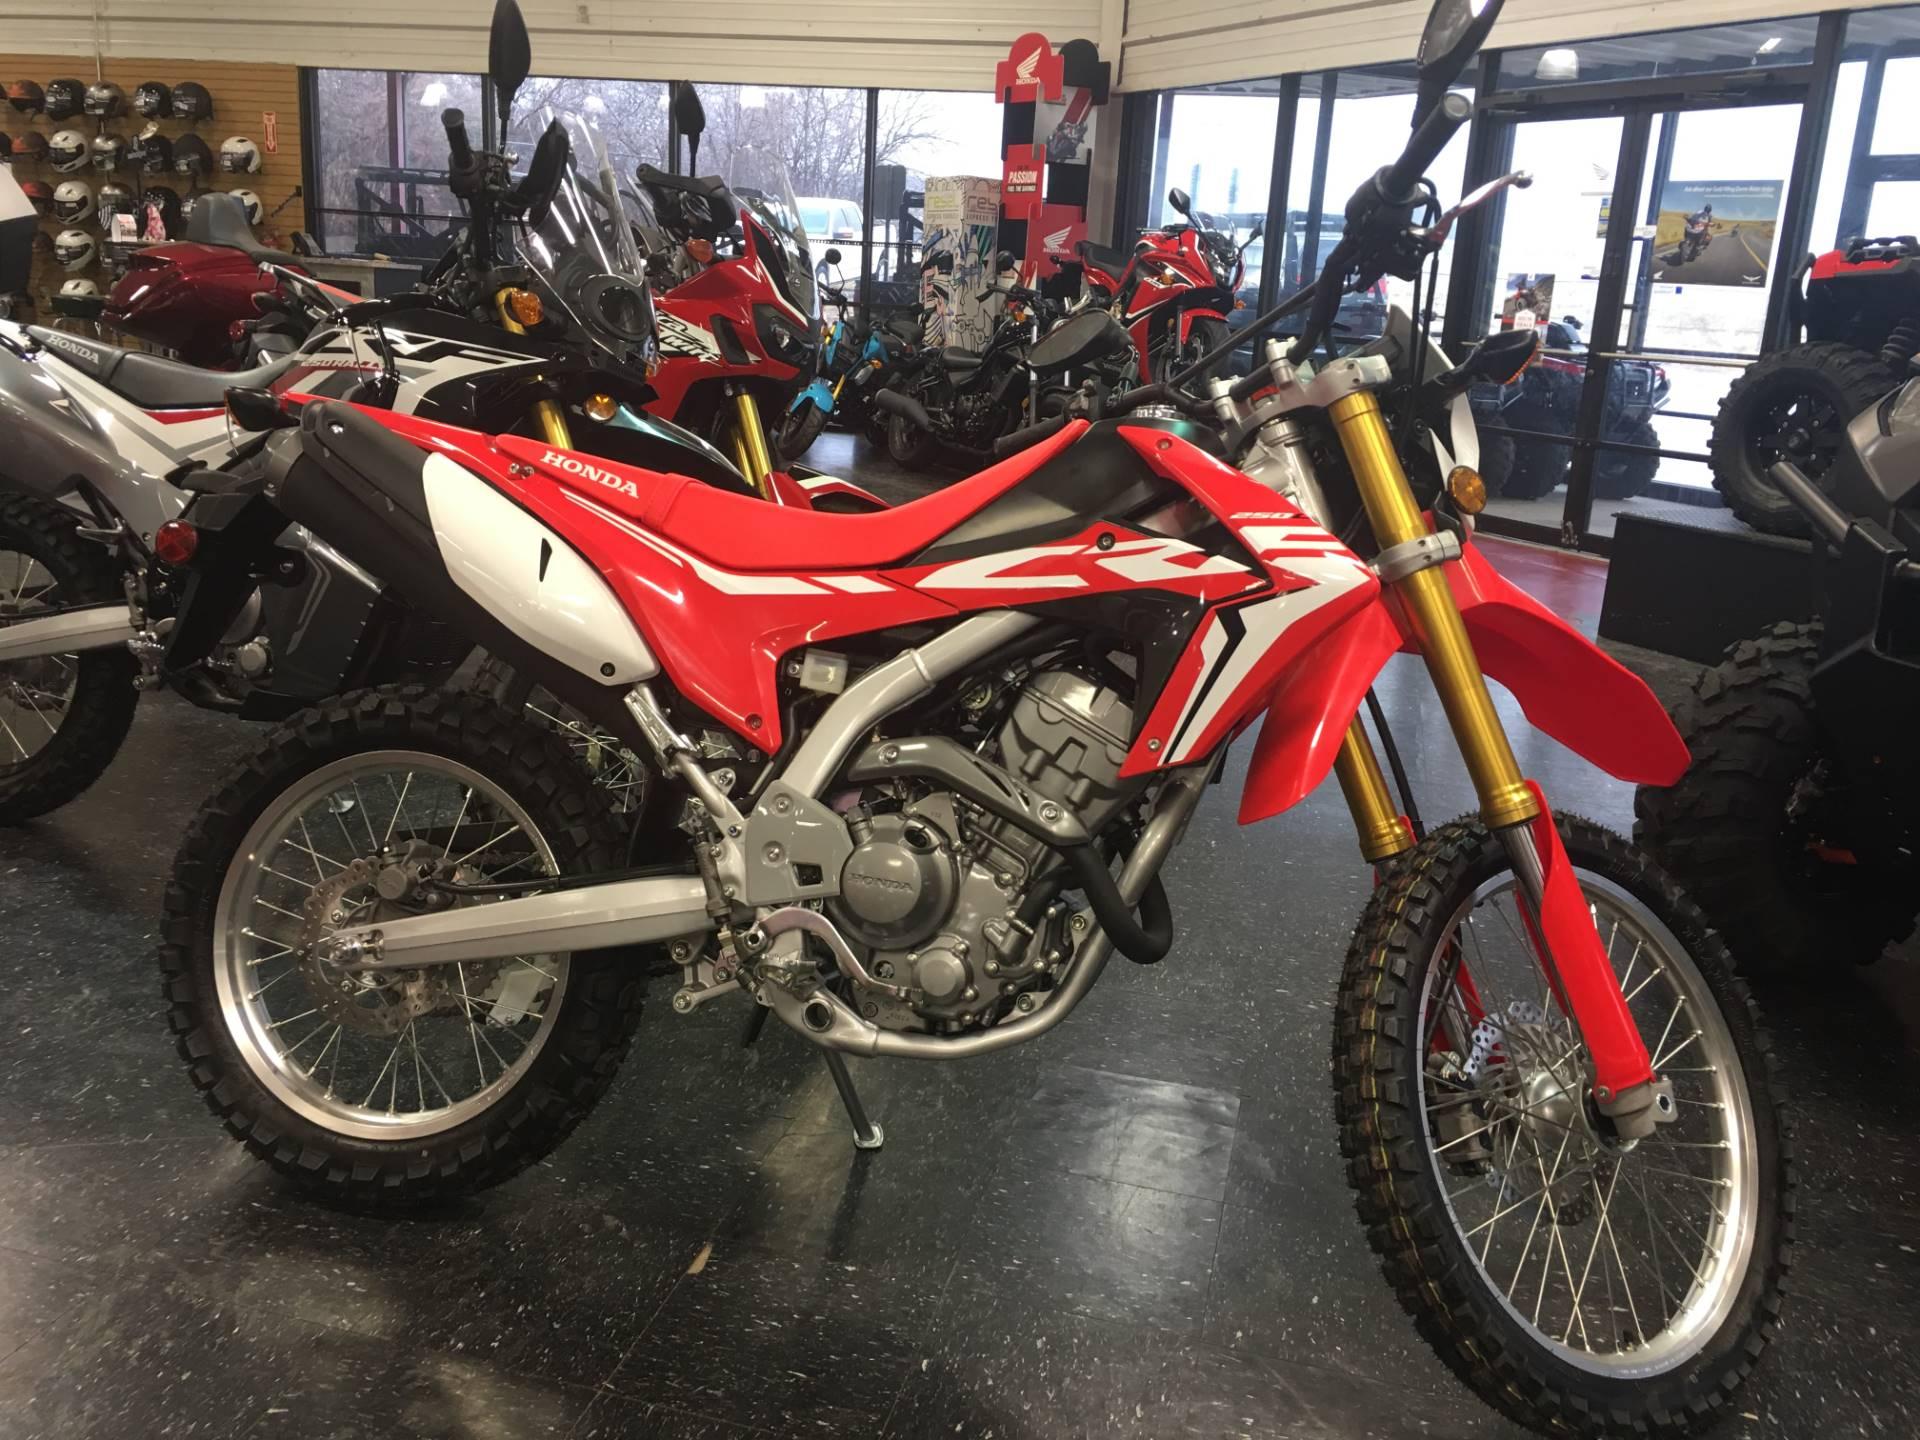 New 2018 Honda CRF250L Motorcycles in Broken Arrow, OK Outside the Tulsa Metro | Stock Number ...